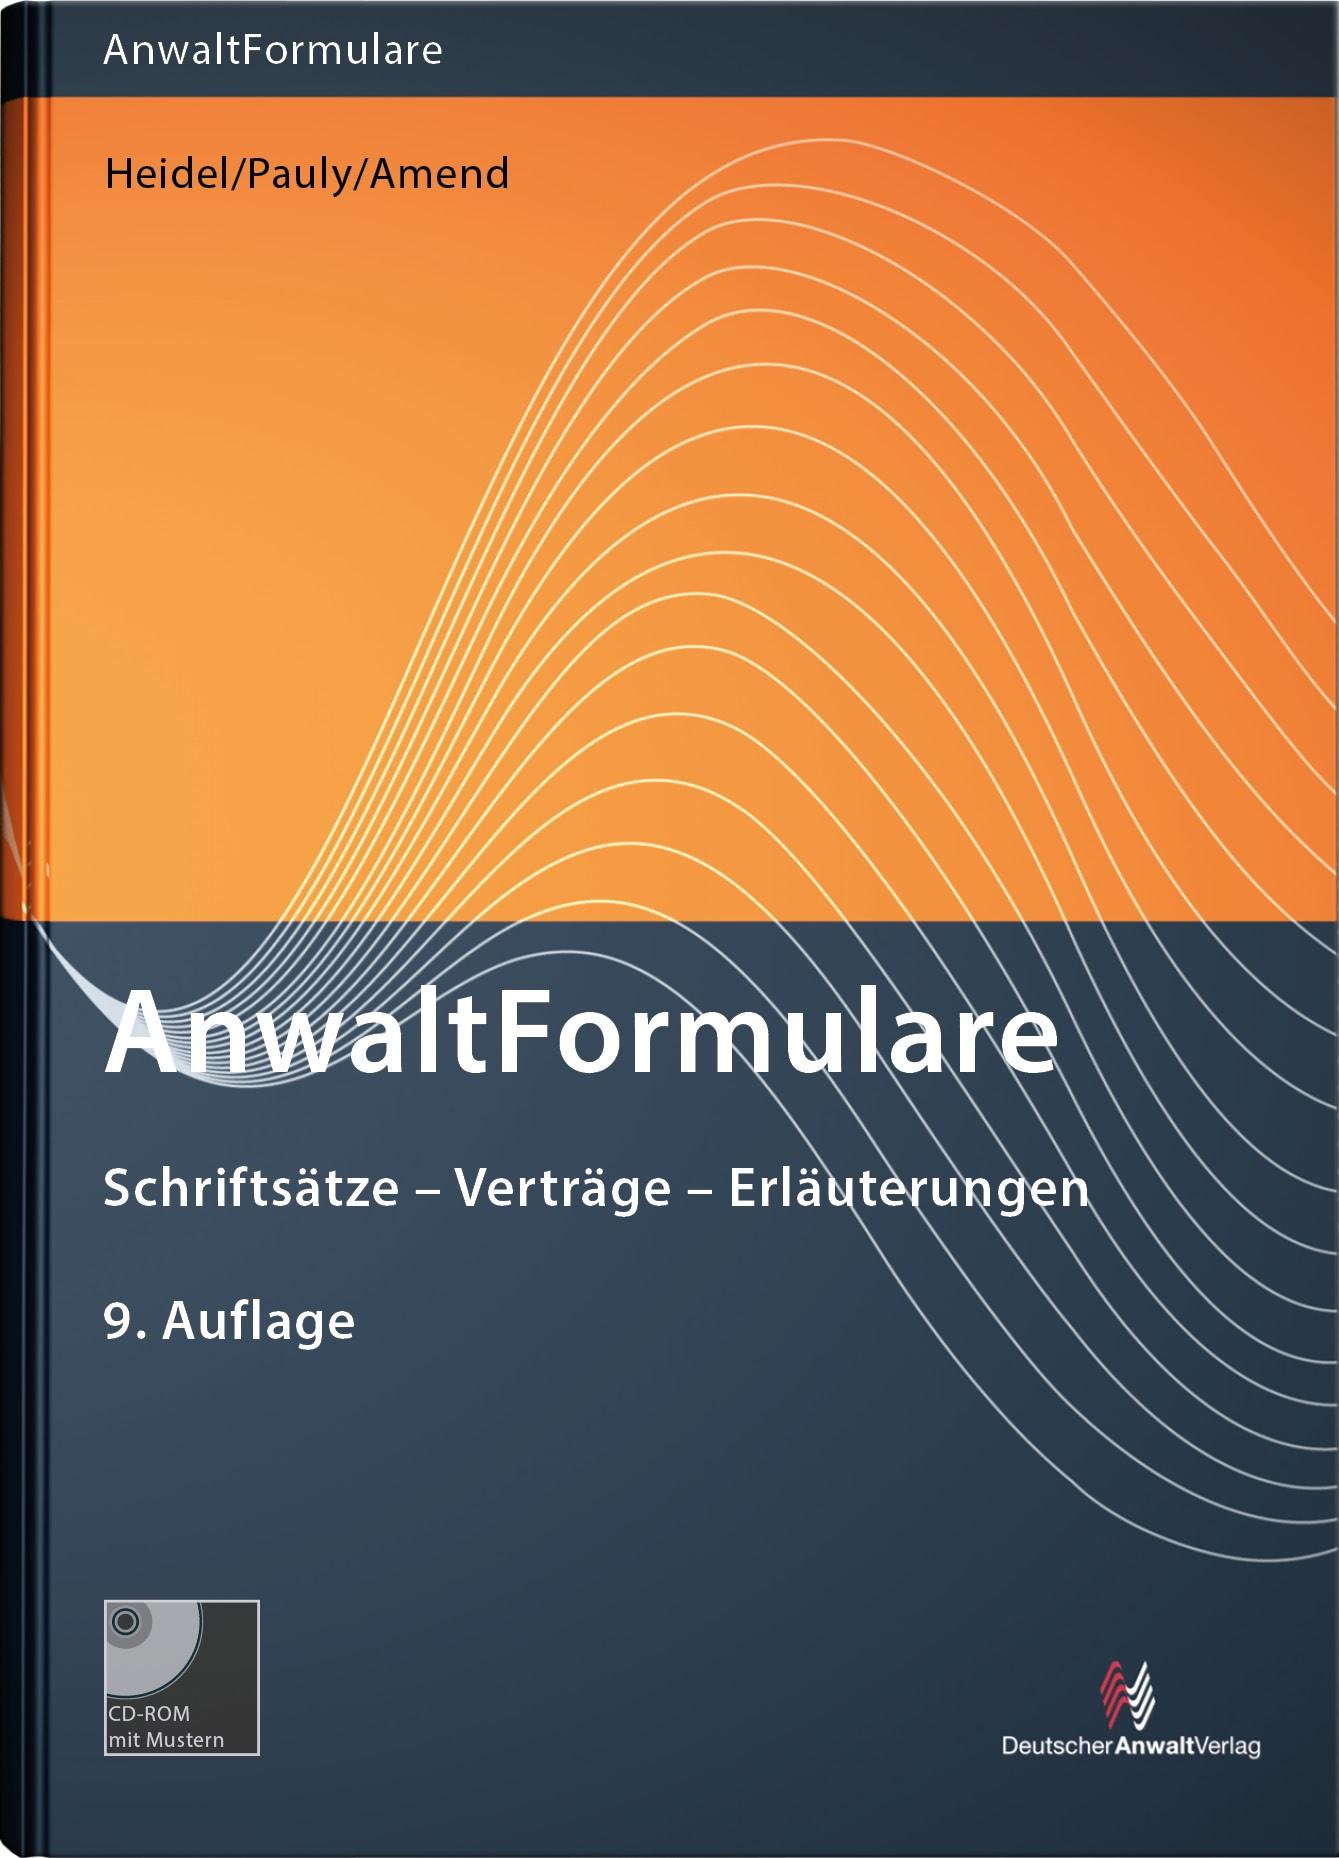 AnwaltFormulare | Heidel / Pauly / Amend (Hrsg.) | 9. Auflage, 2018 (Cover)